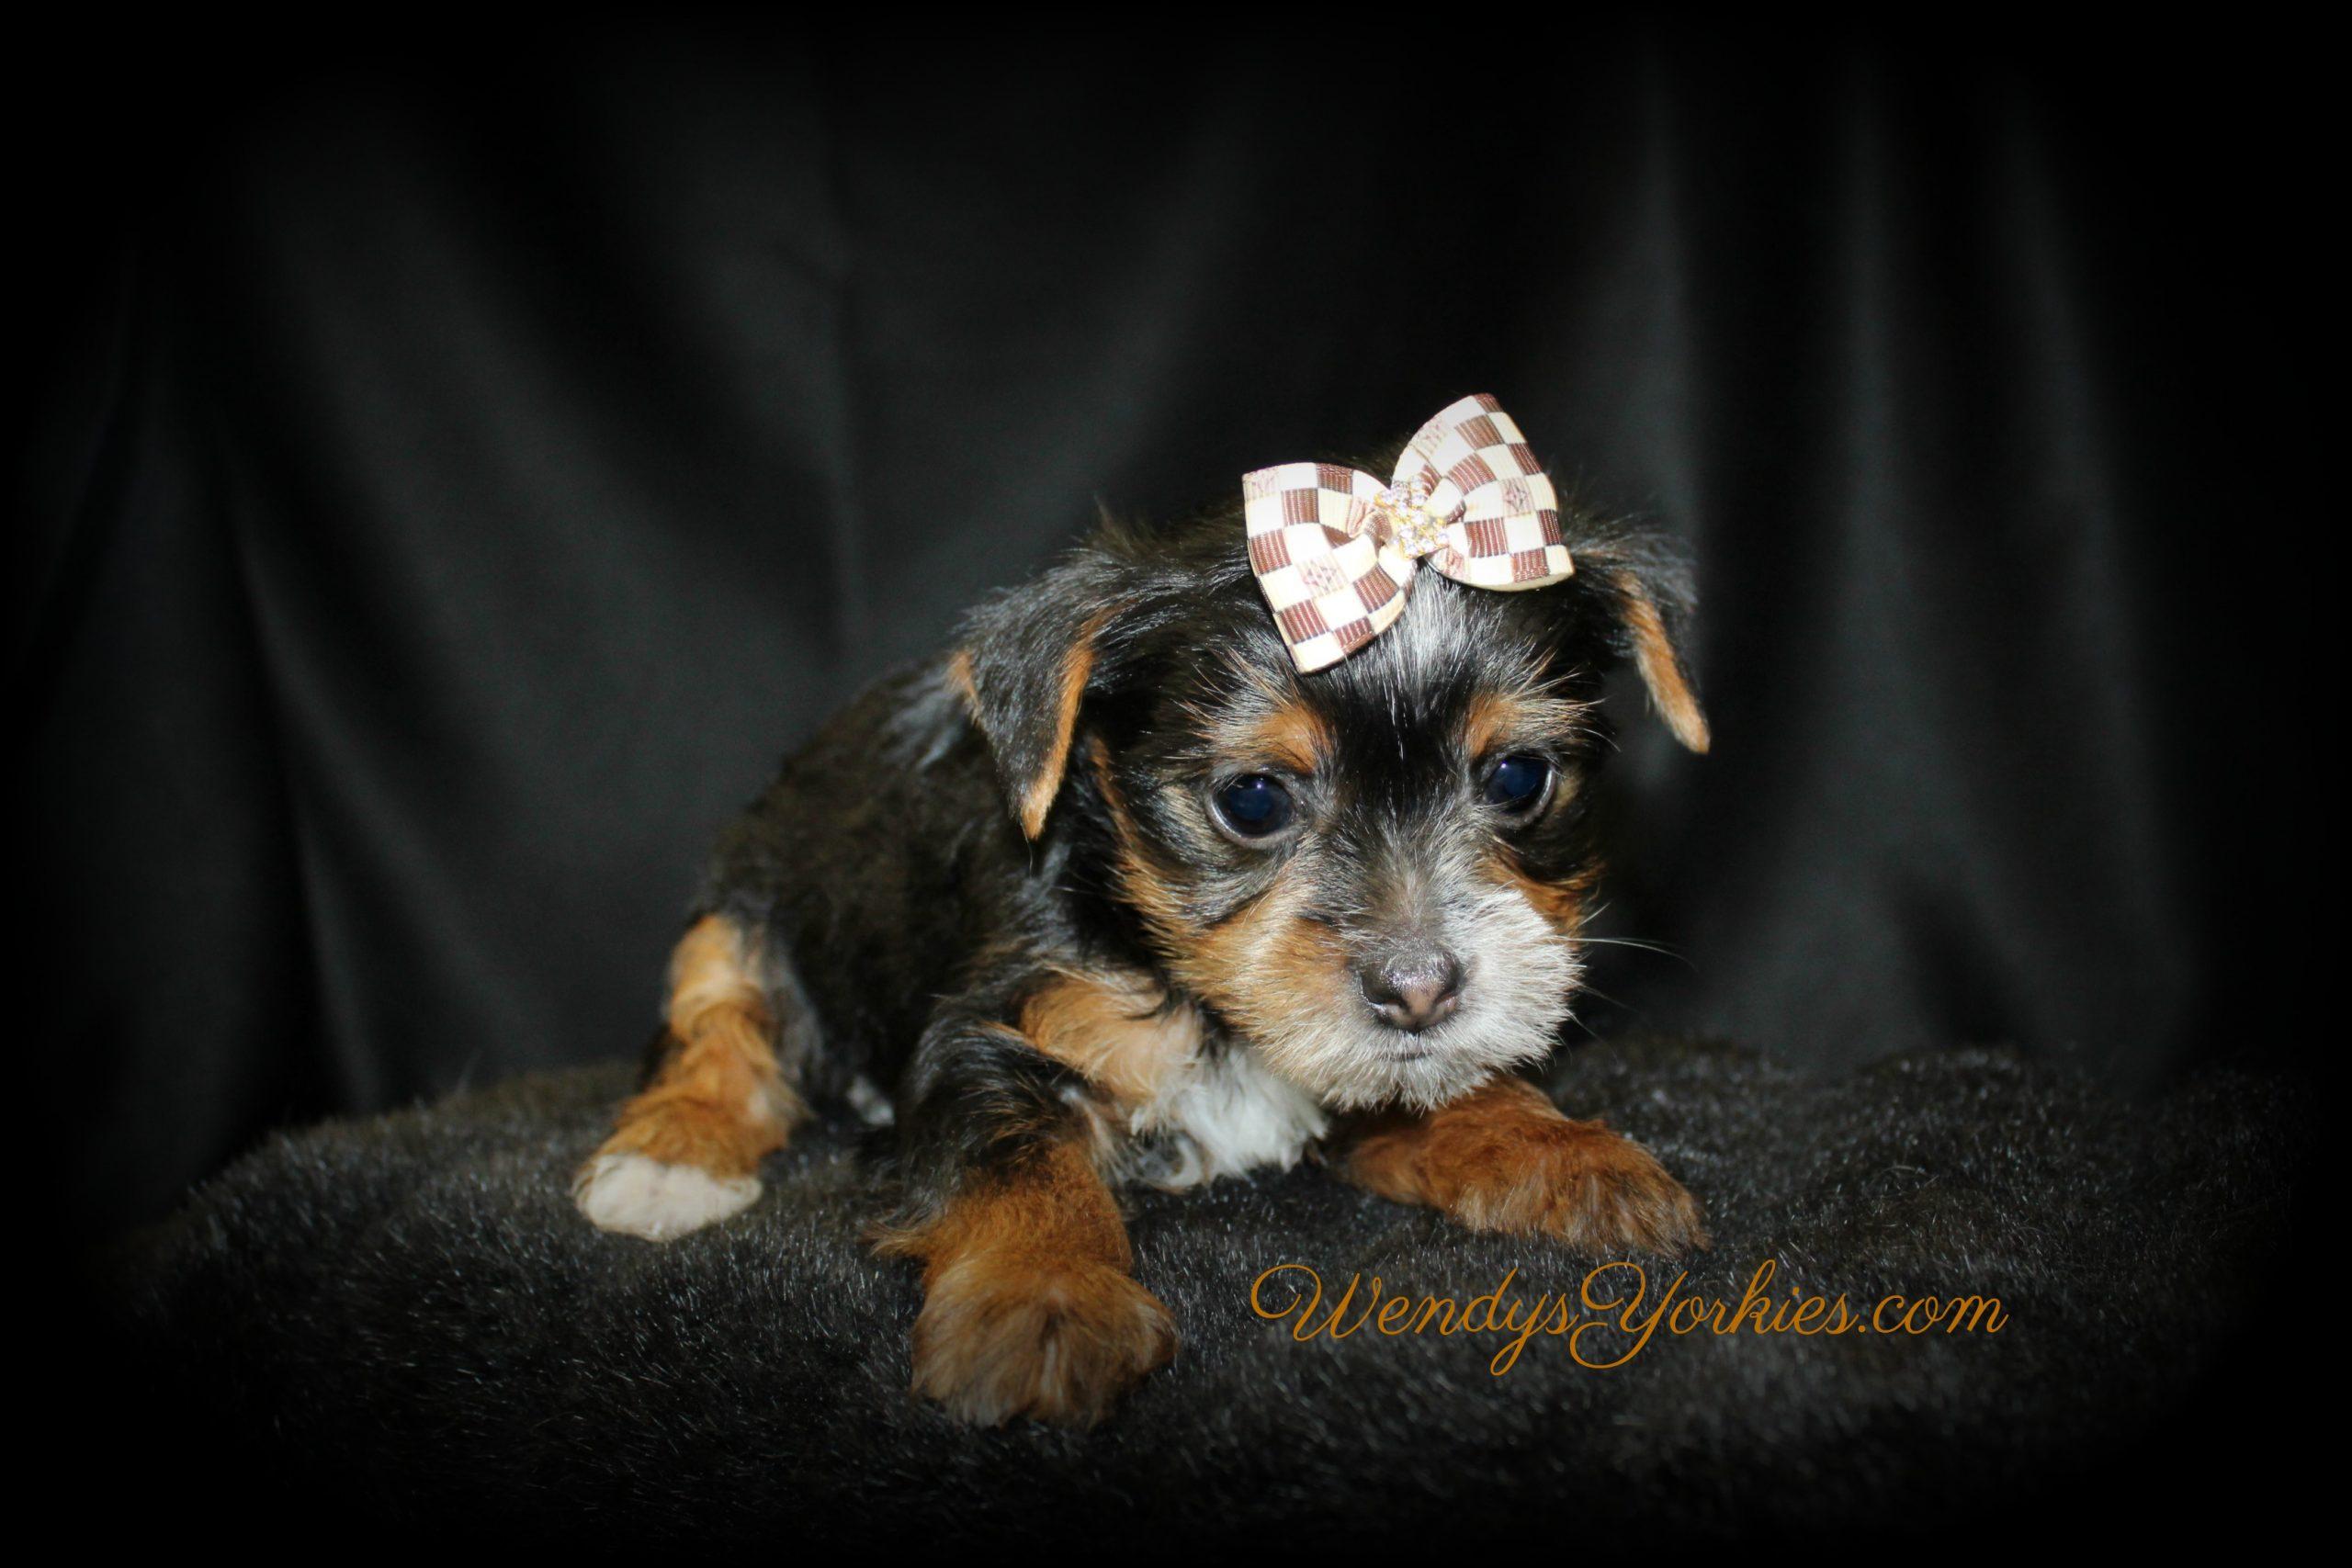 Male Parti Yorkie puppy, WendysYorkies.com